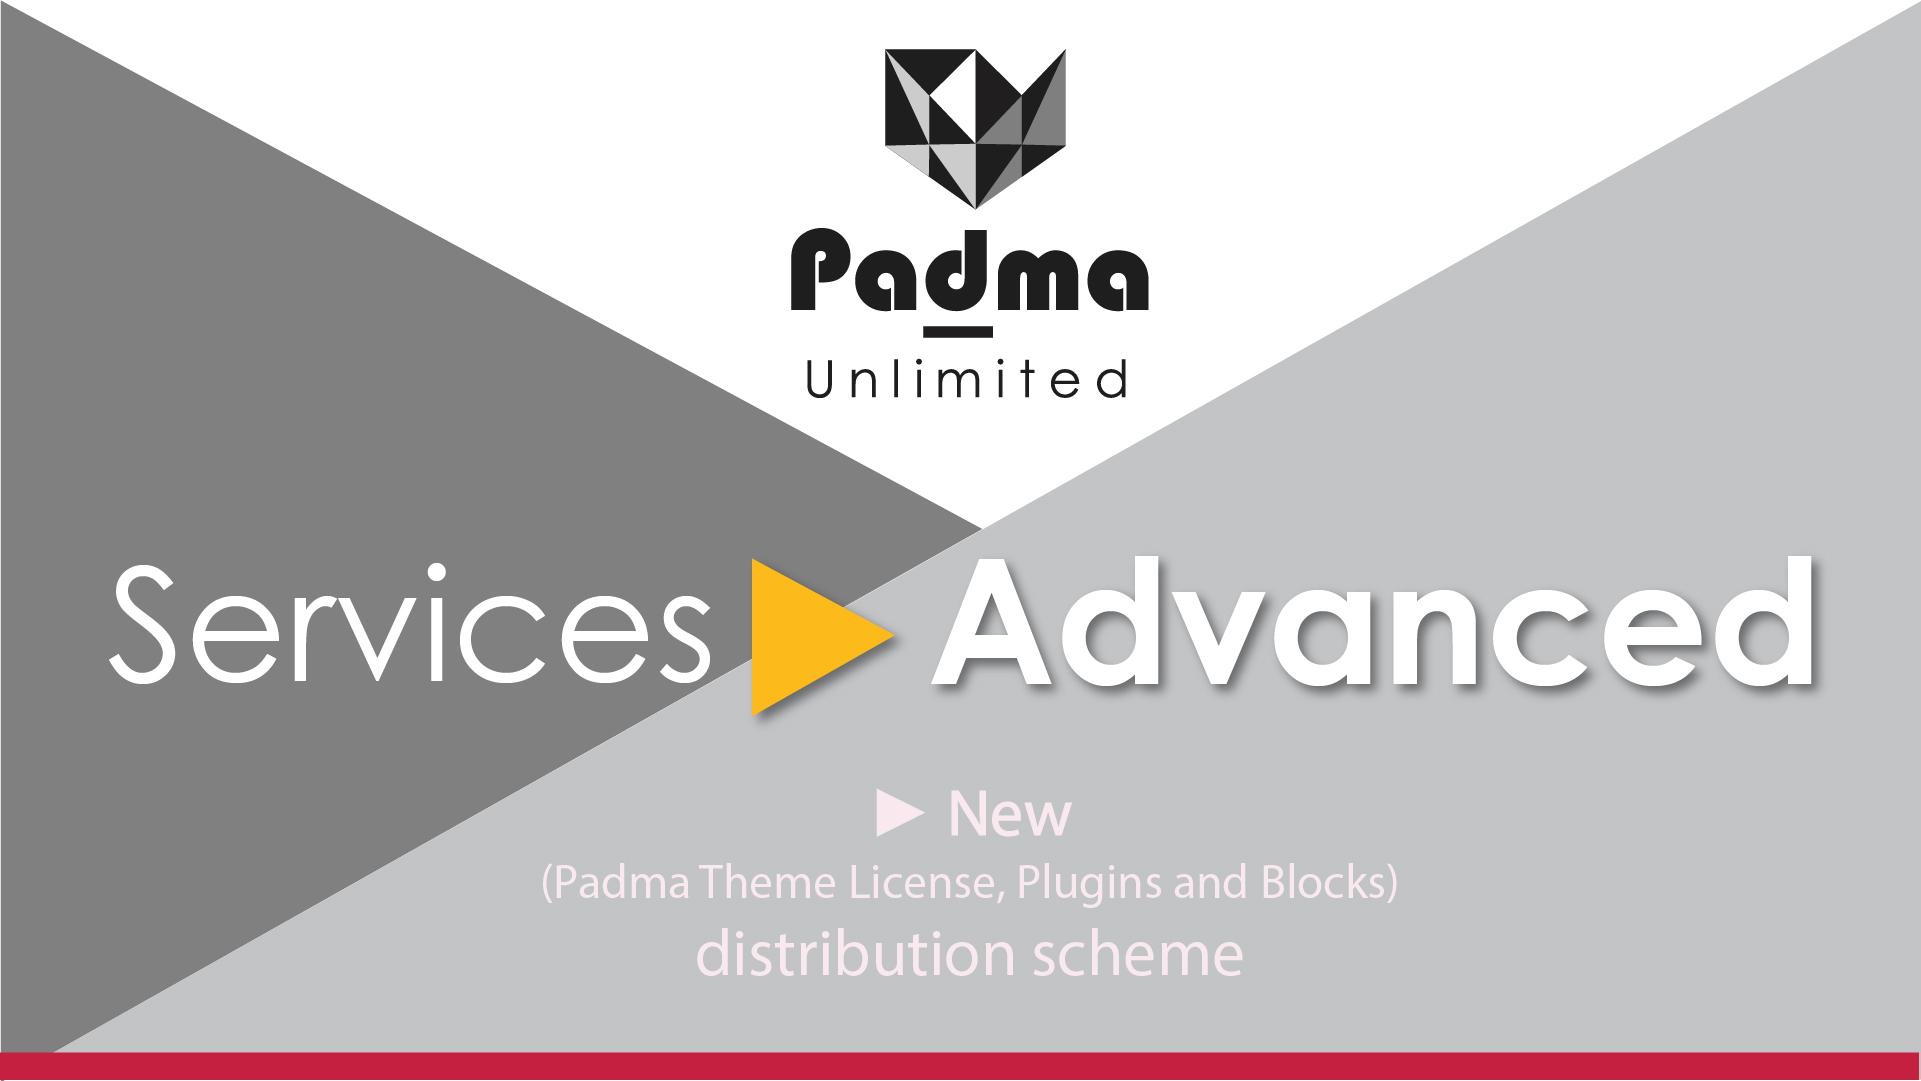 New Padma Theme License, Plugins and Blocks distribution scheme